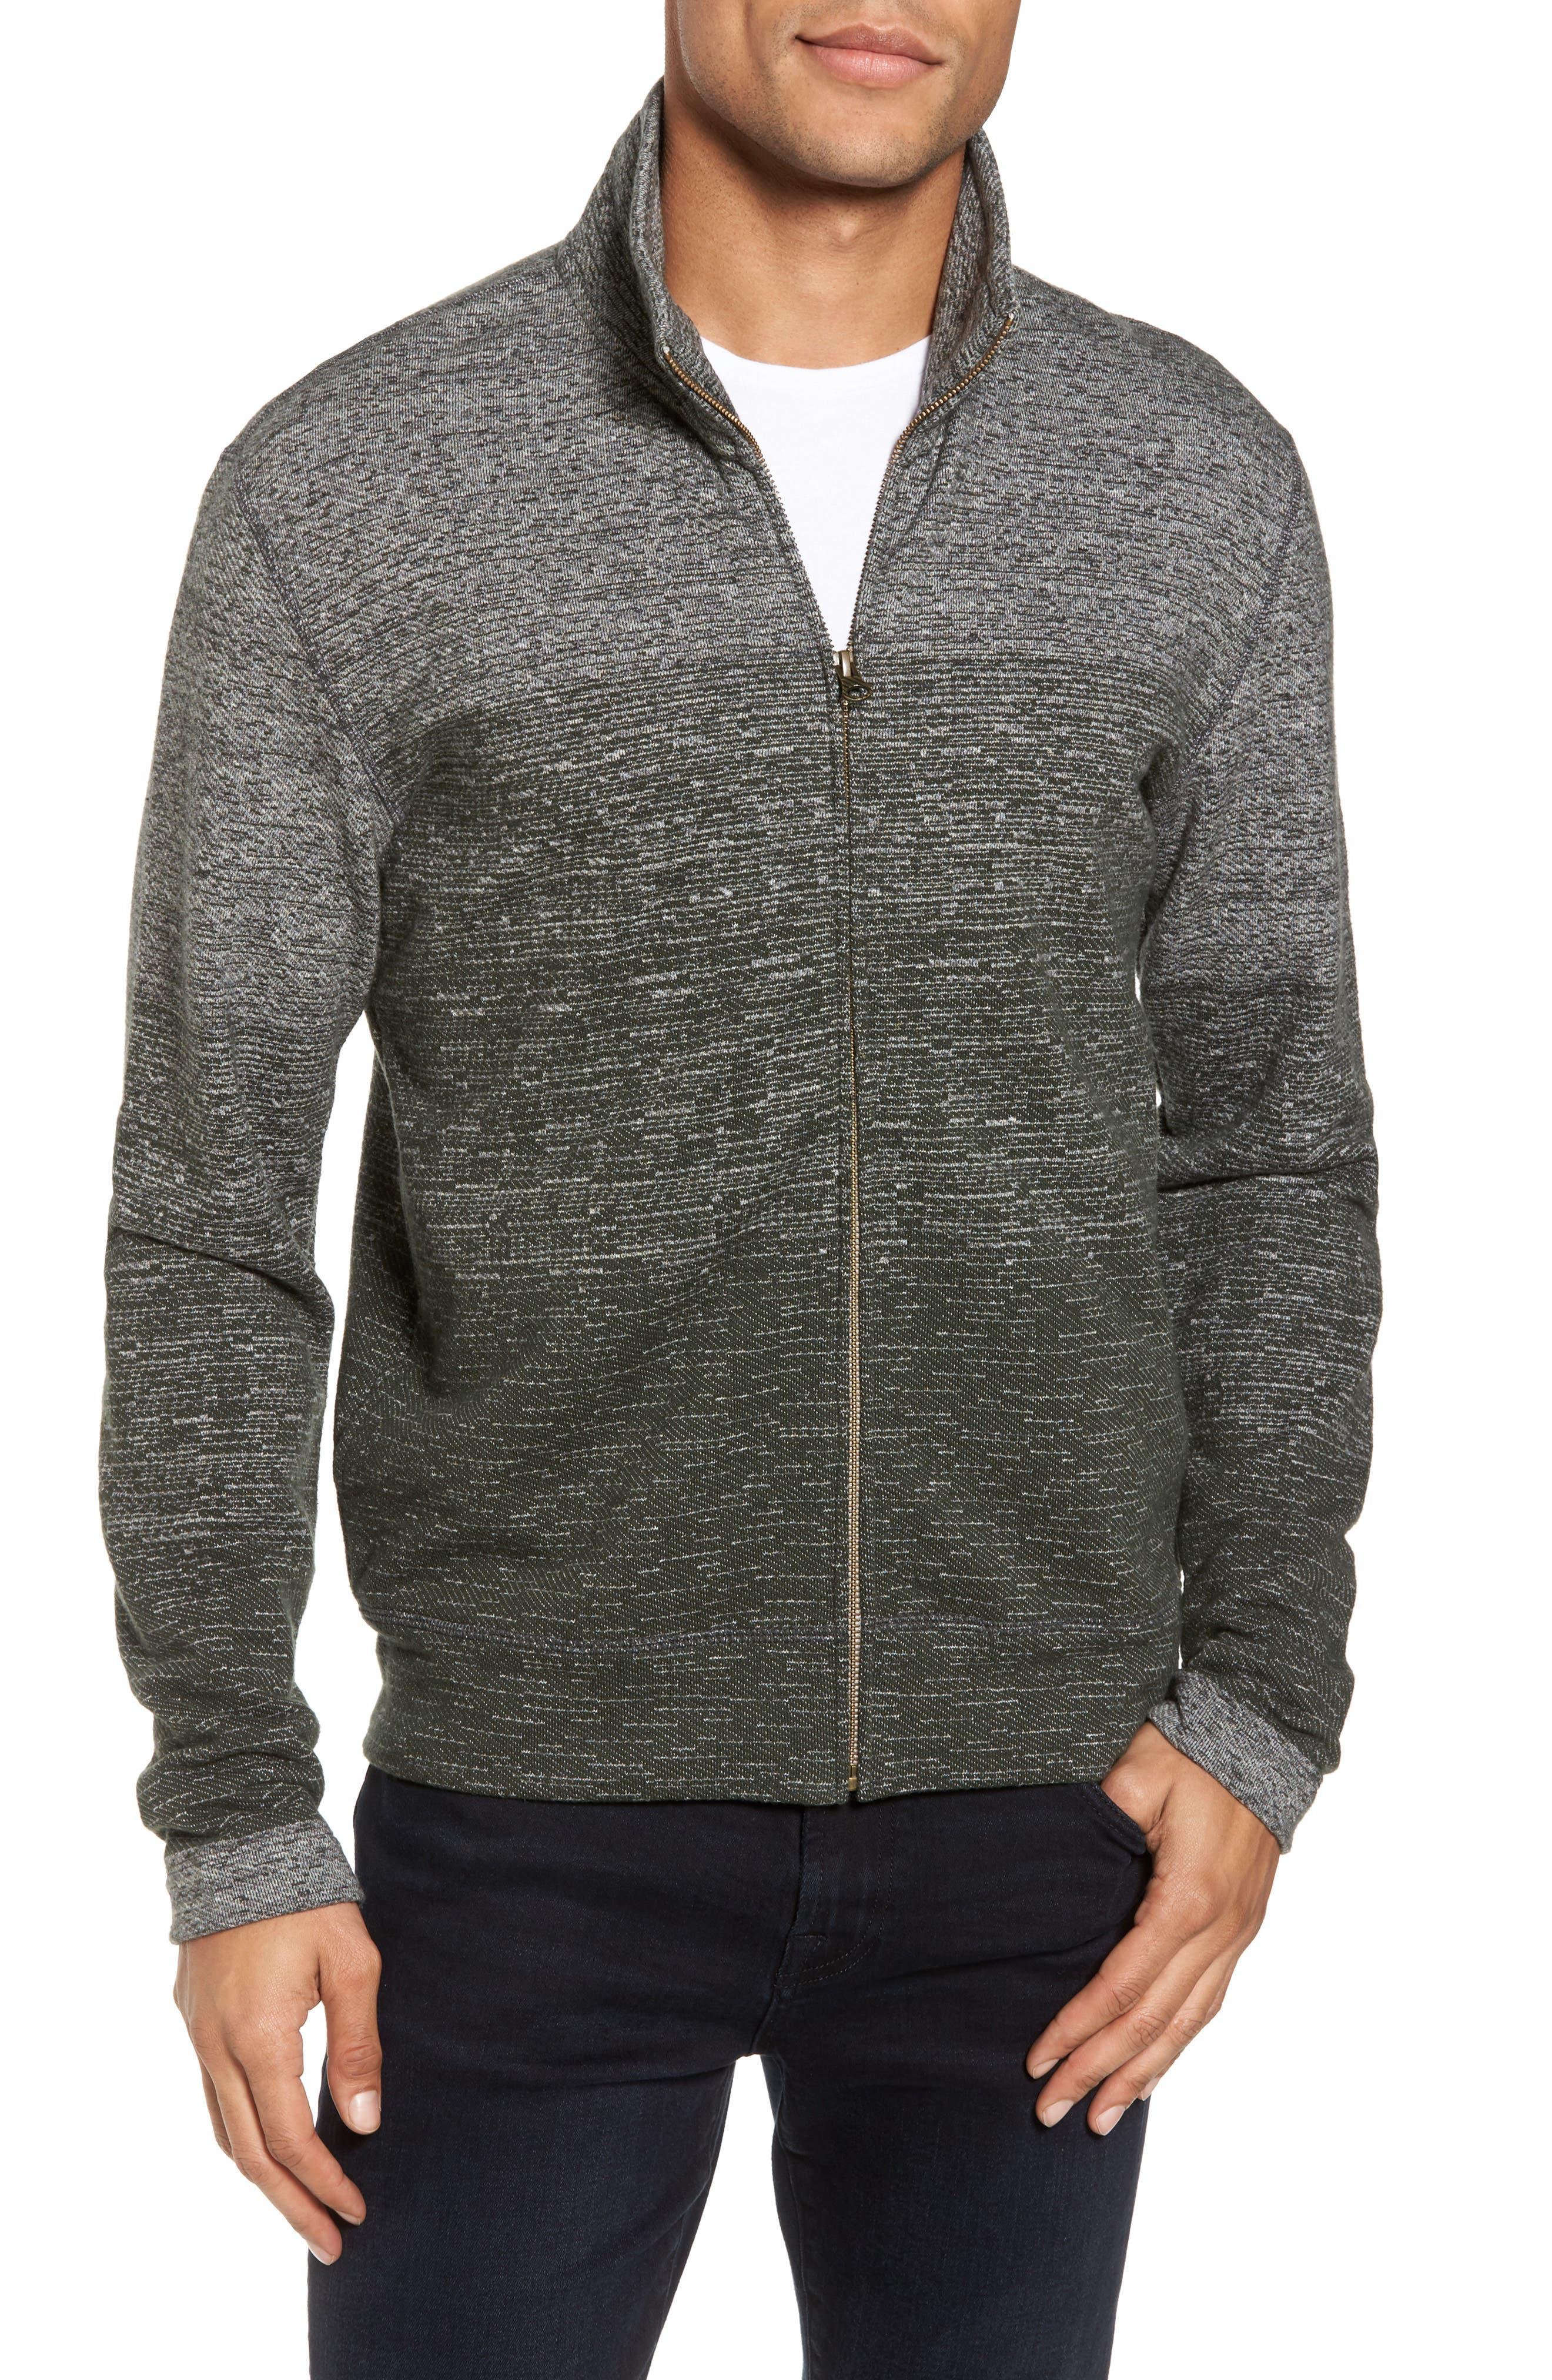 Gradient Track Jacket,                             Main thumbnail 1, color,                             Charcoal/ Pine